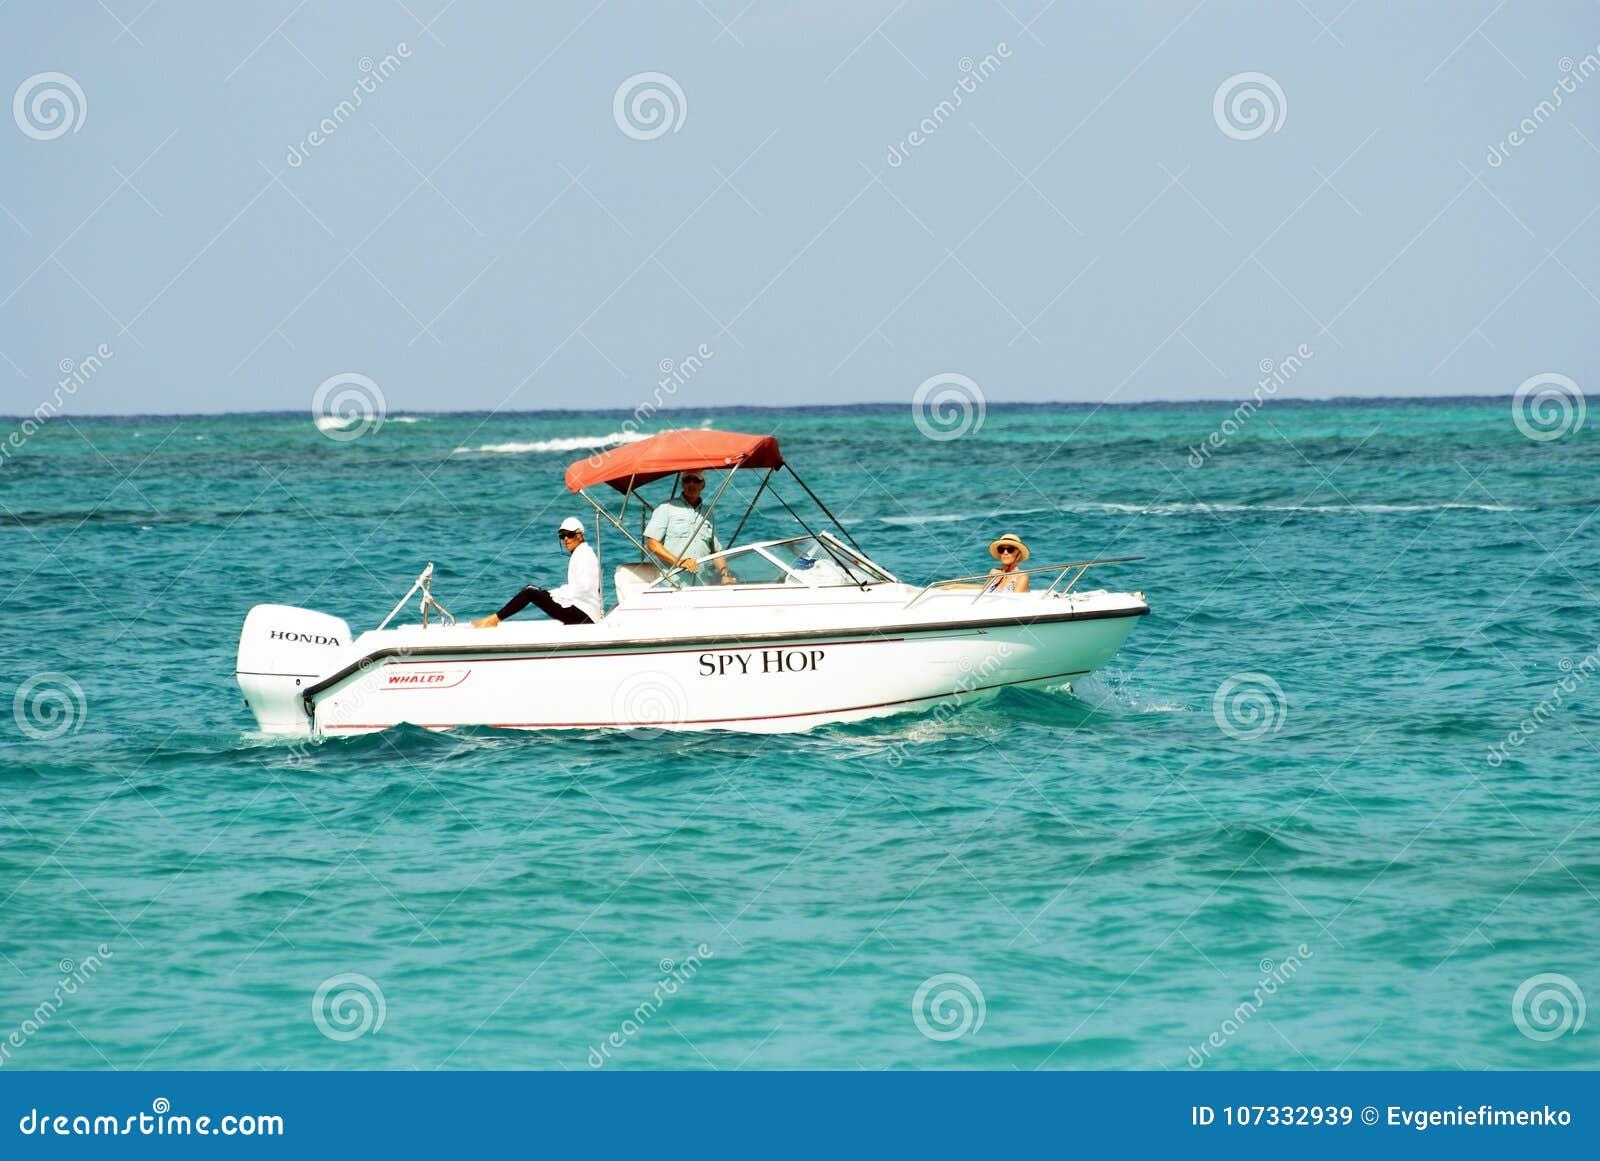 Motor boat cruising in ocean with passengers